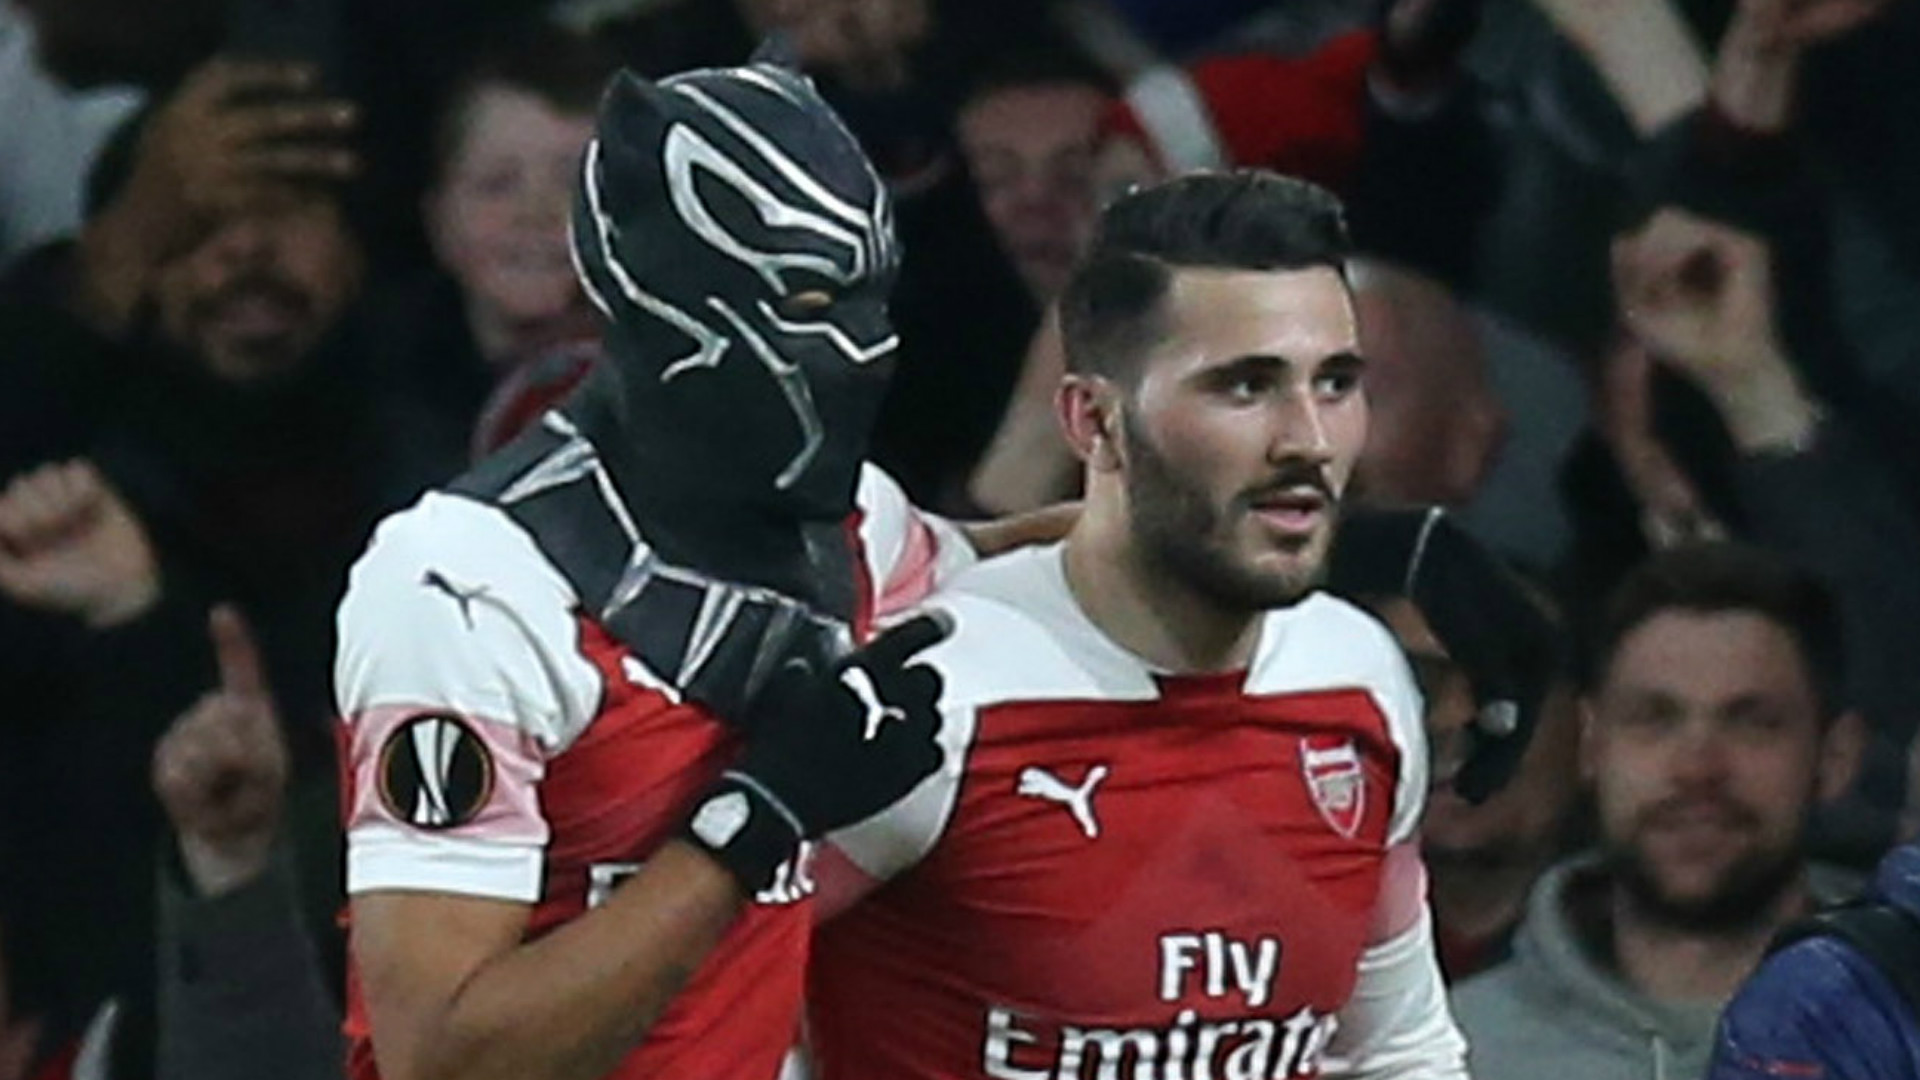 Pierre-Emerick Aubameyang brace fires Arsenal past Rennes